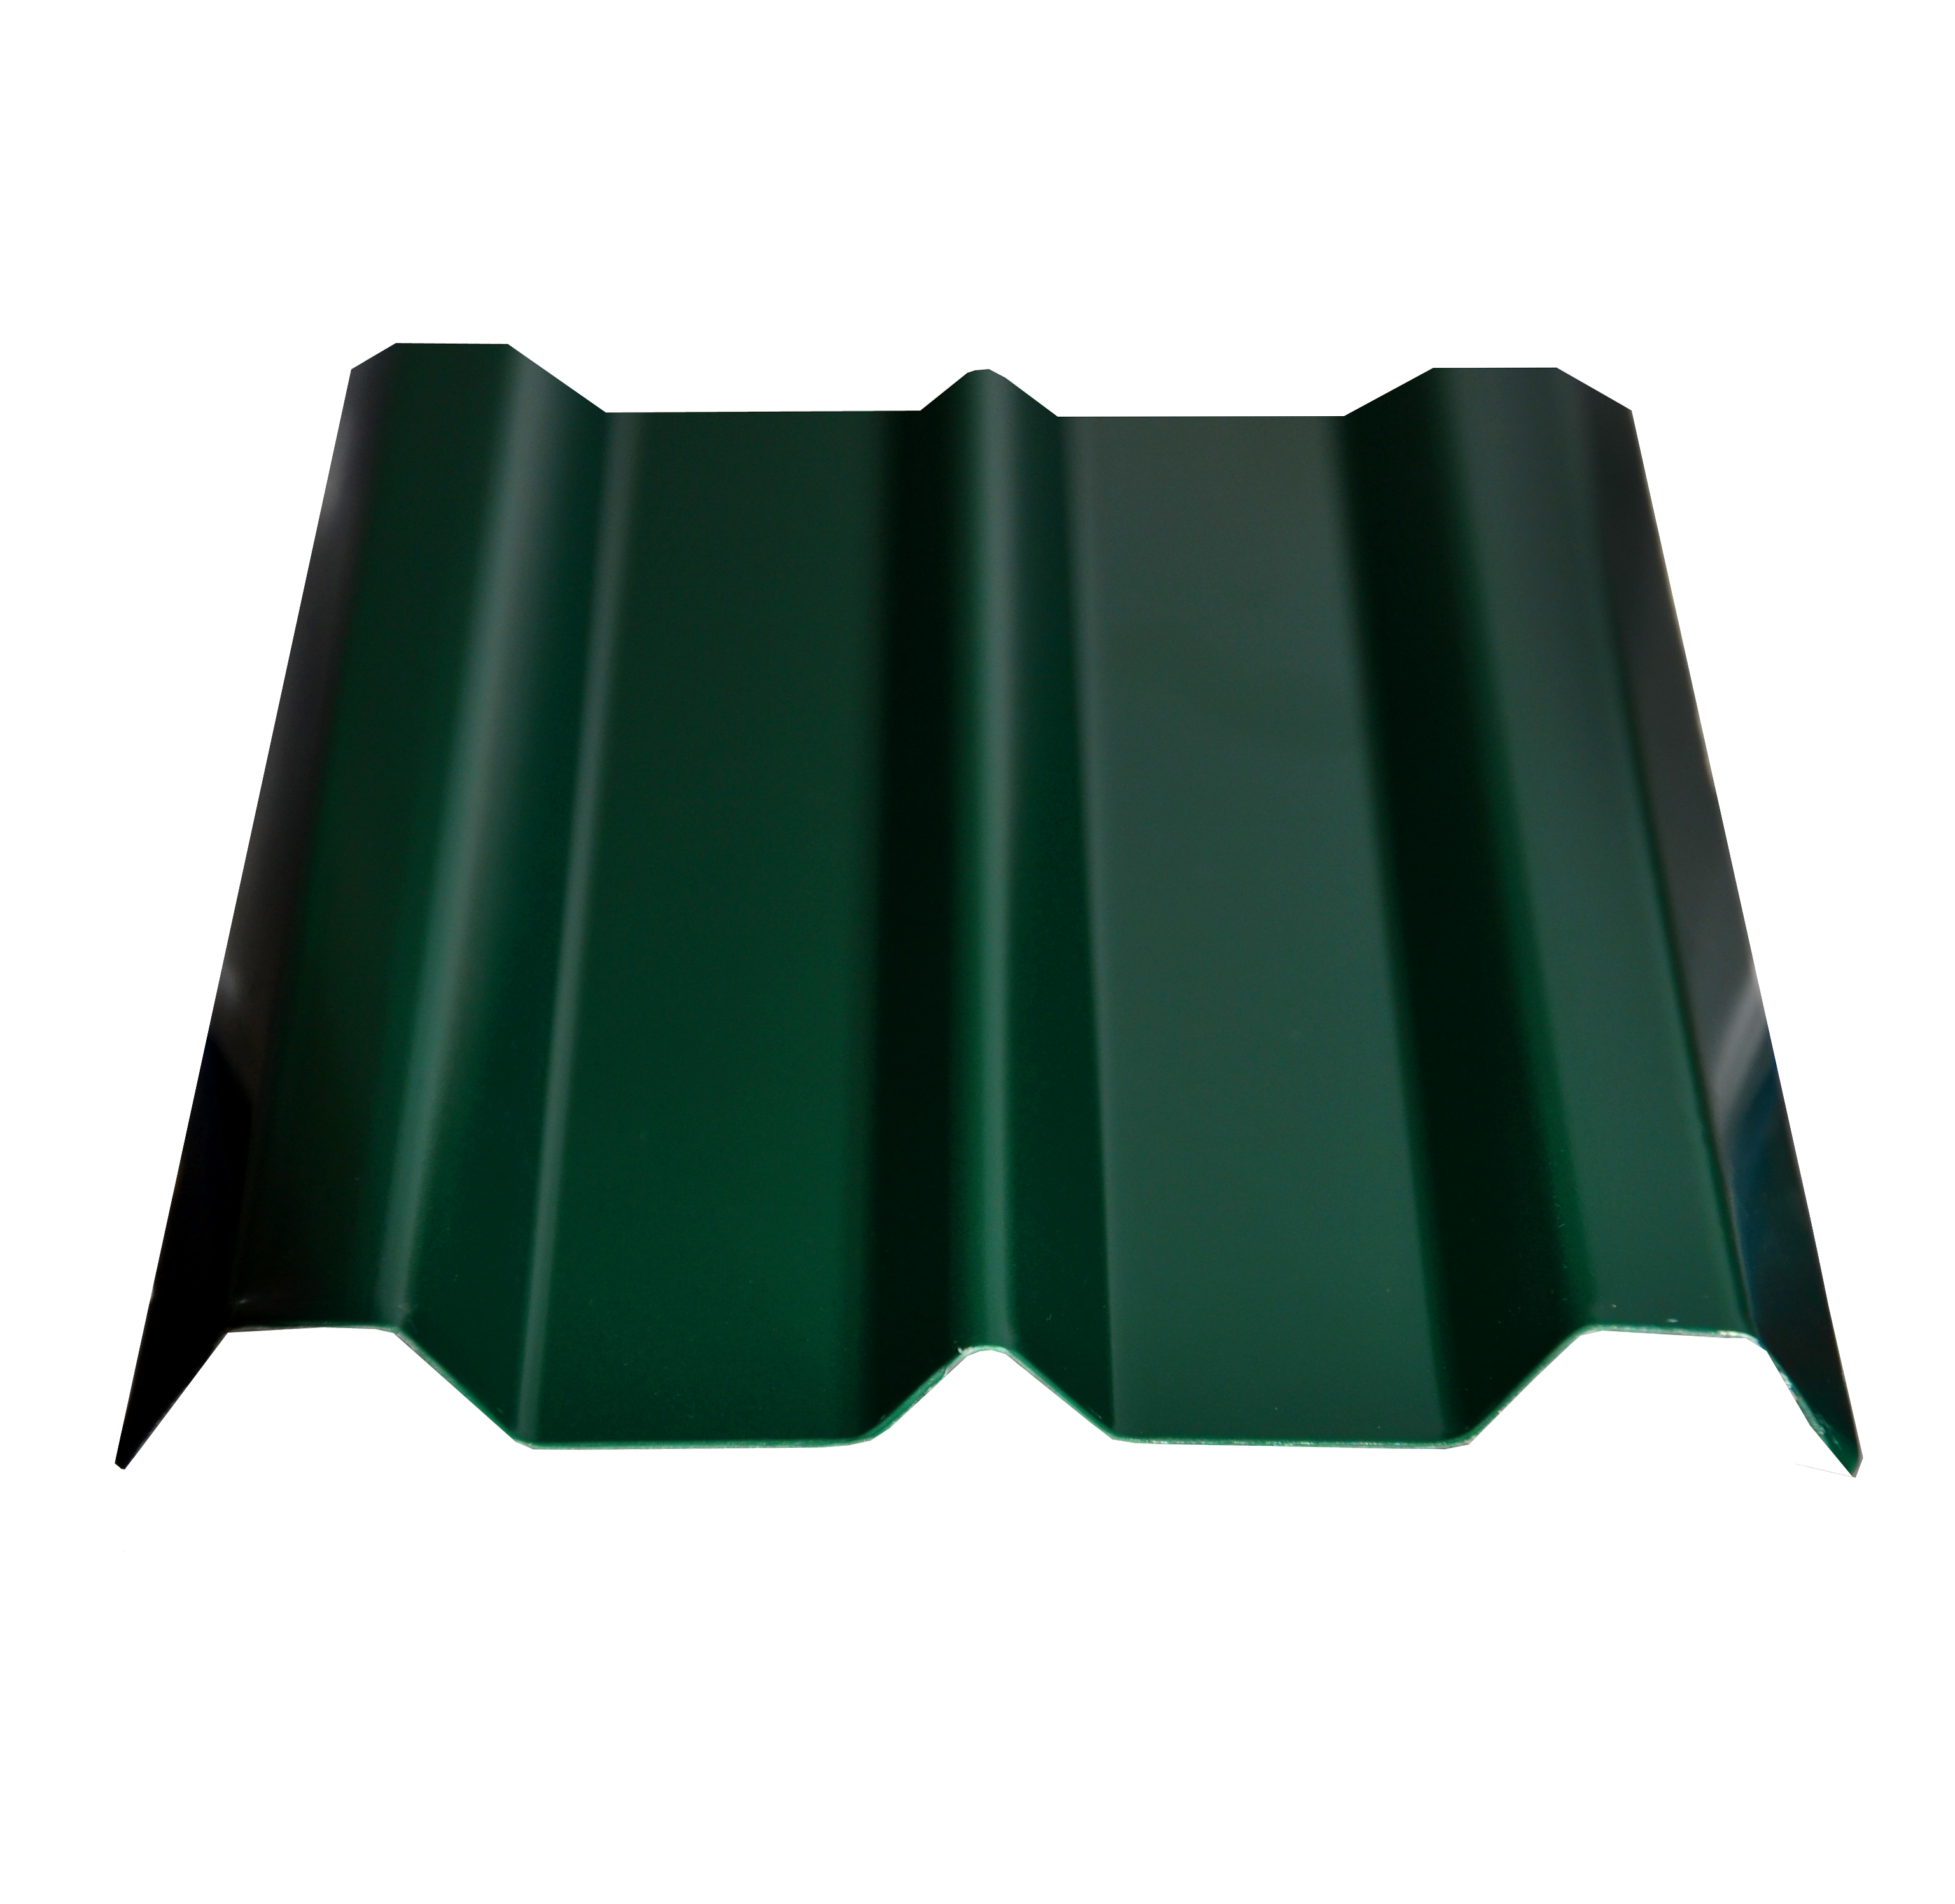 Евроштакетник 100х1500мм, толщина 0,4 мм зеленый